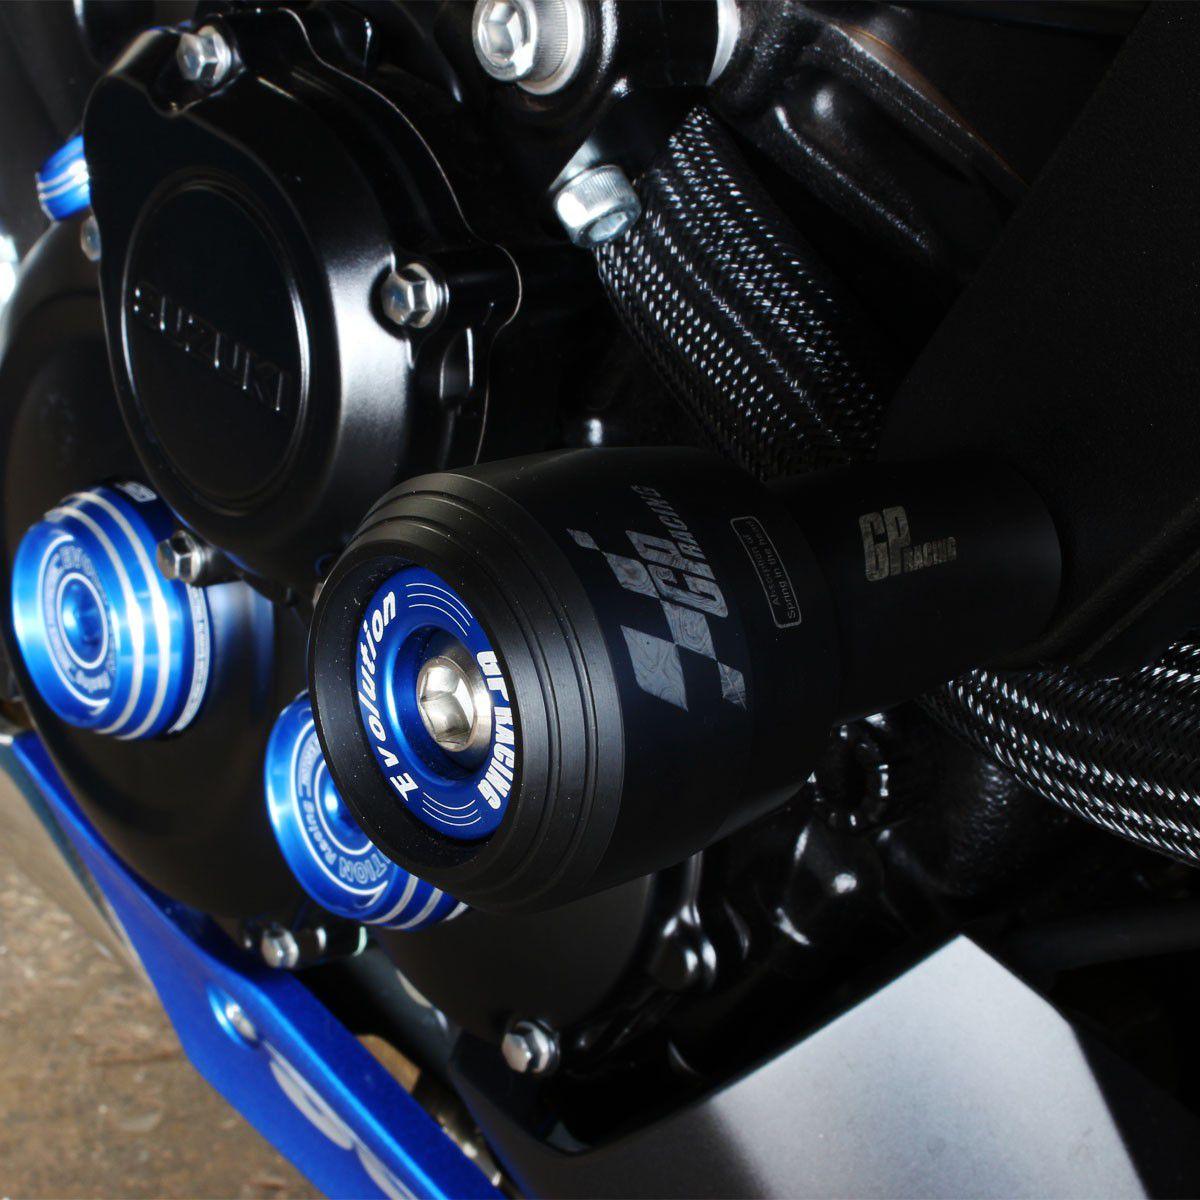 Slider Evolution GP Nylon Suzuki GSXS1000 GSXS 1000 15 16 17